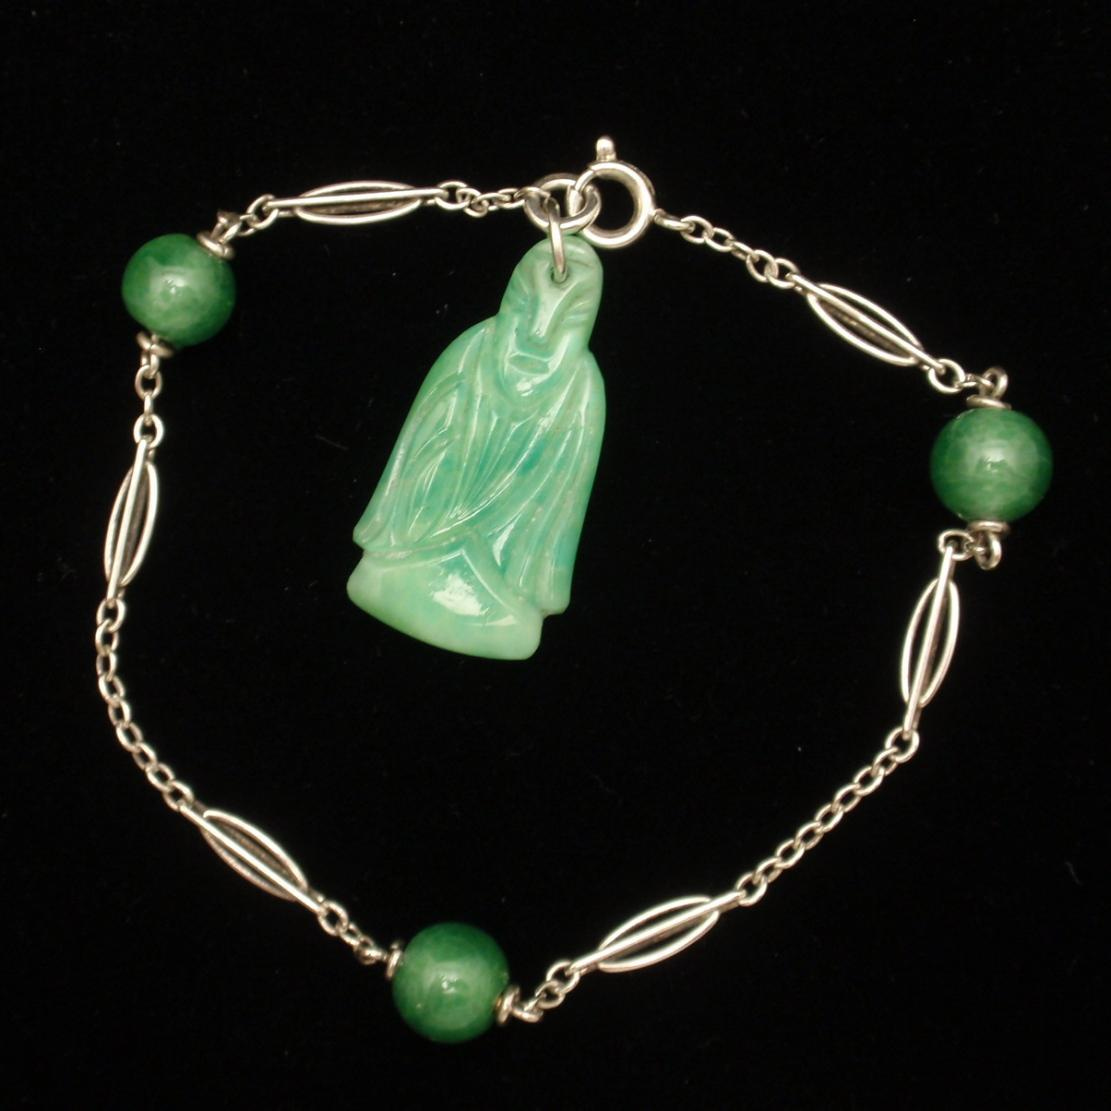 Jade Green Glass Buddha Charm Bracelet Vintage From